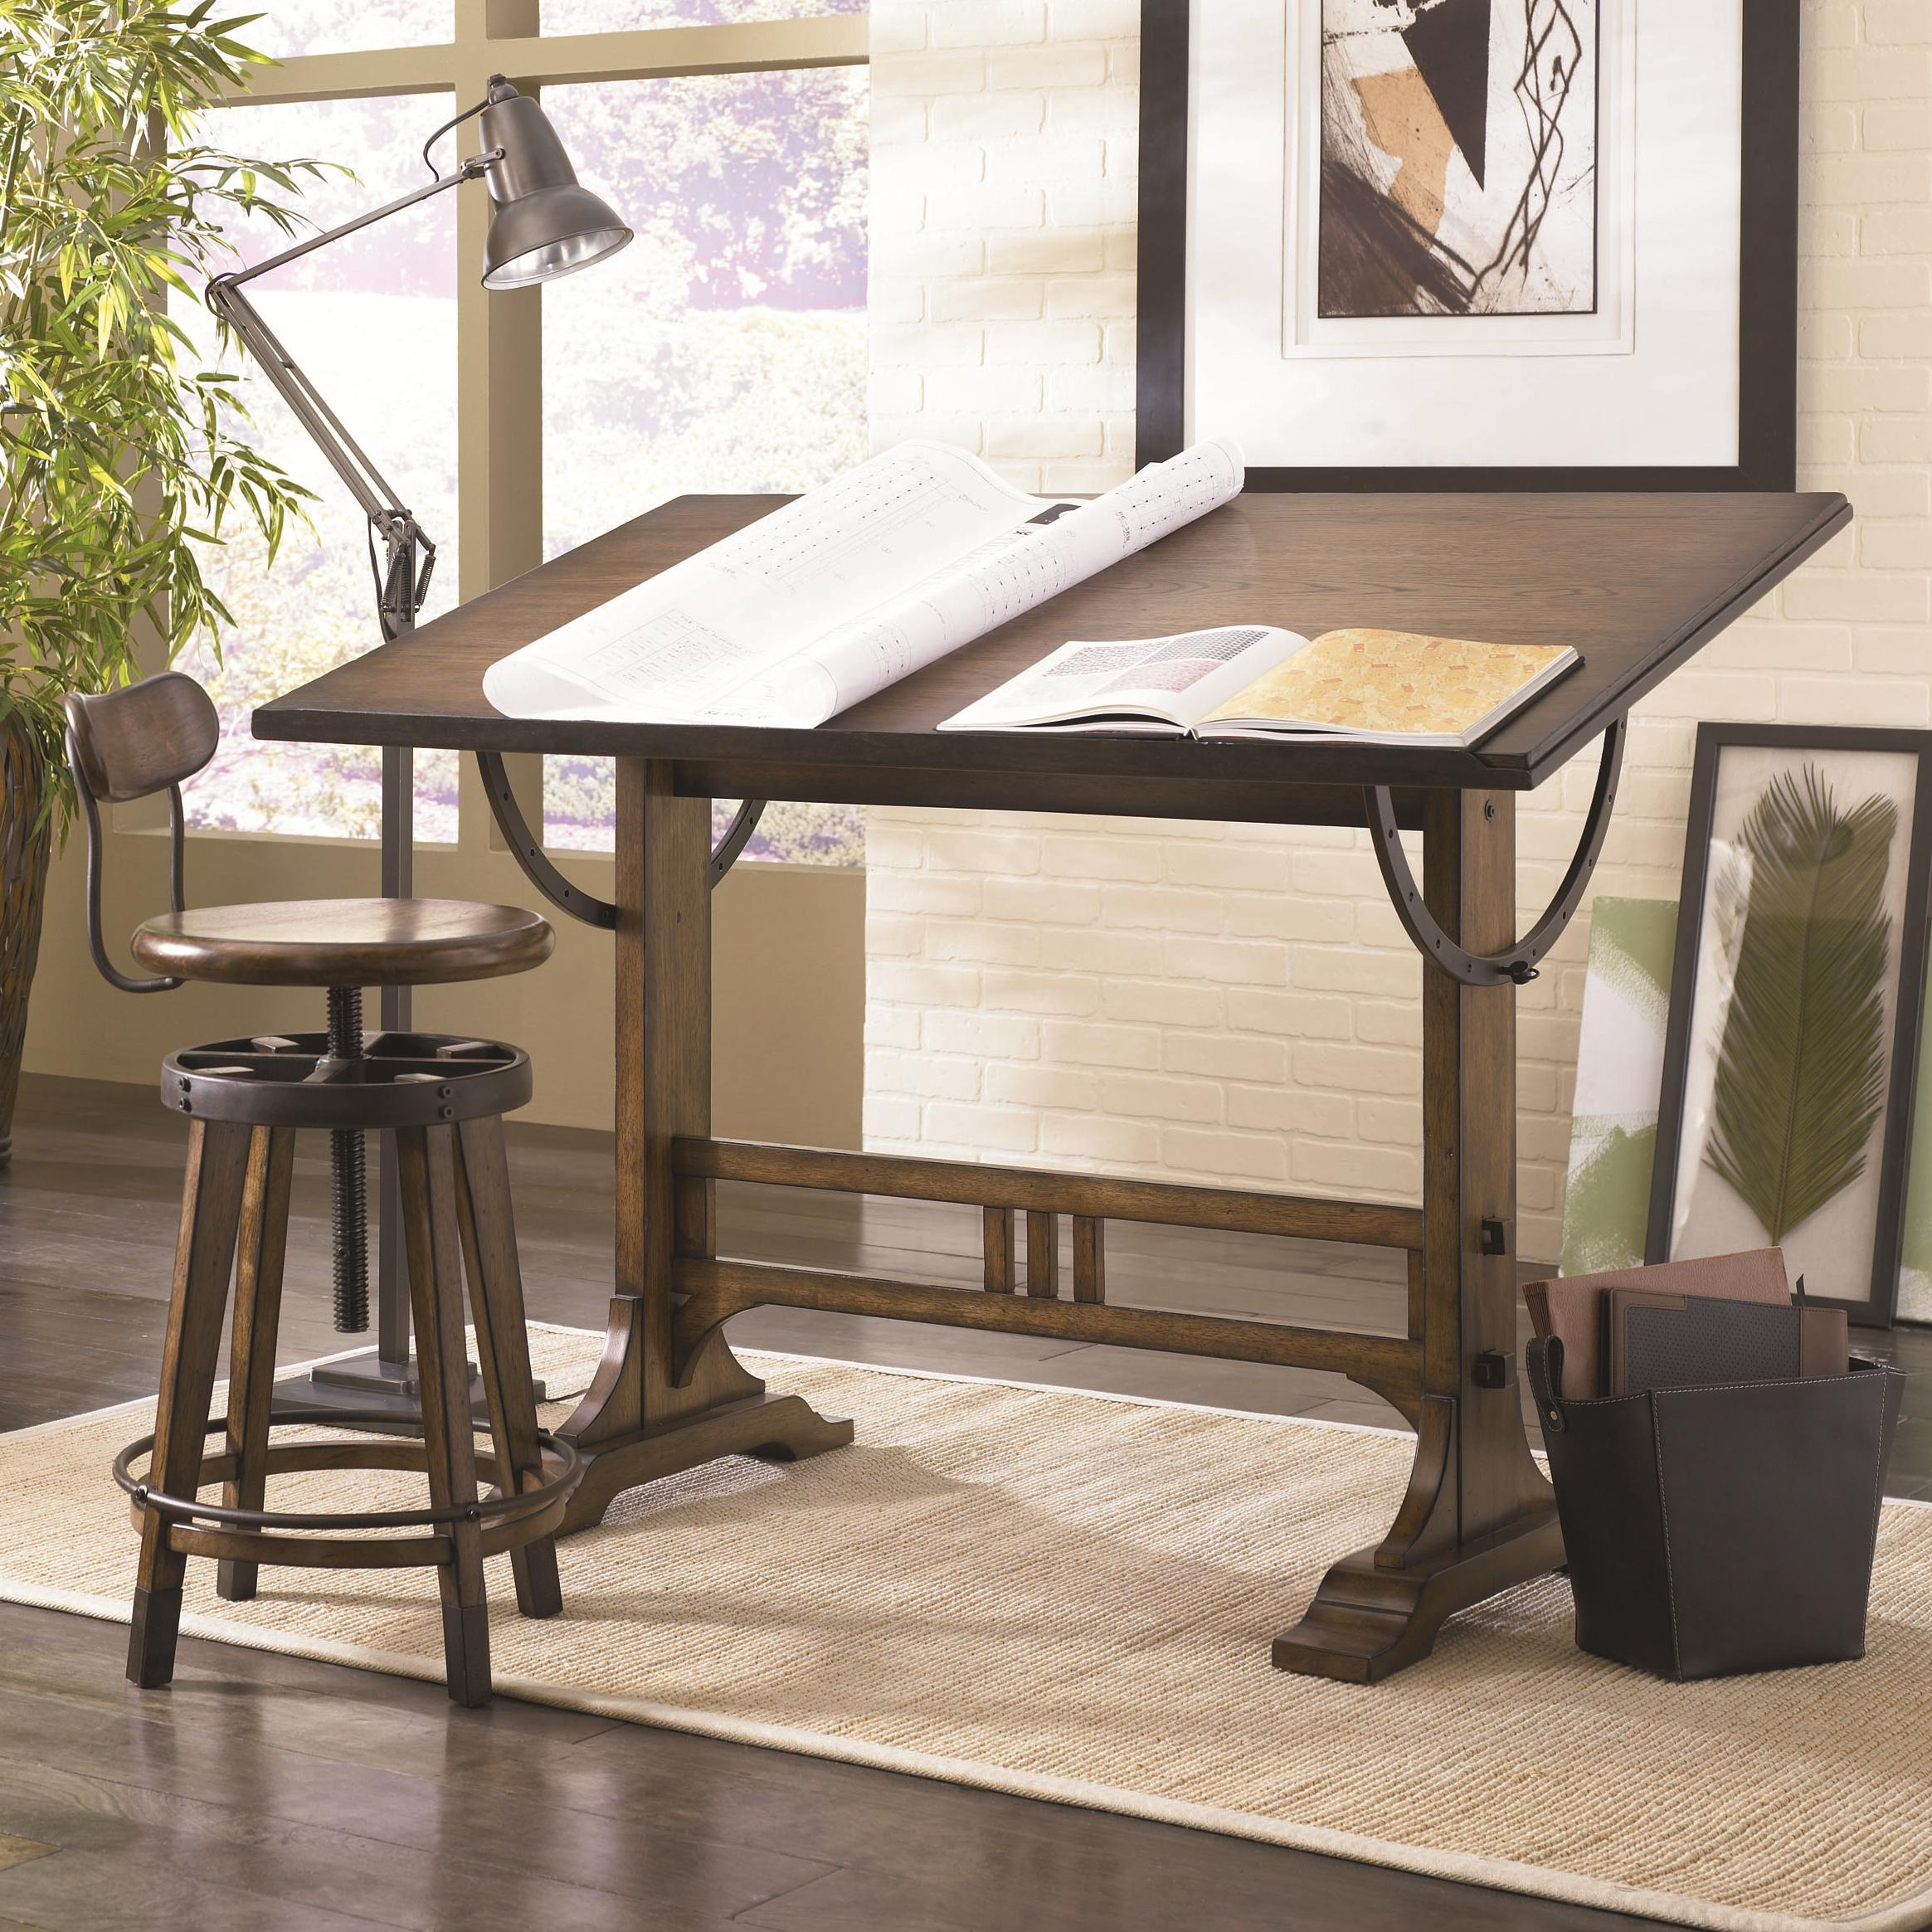 Hammary Studio Home Architect Desk And Adjustable Swivel